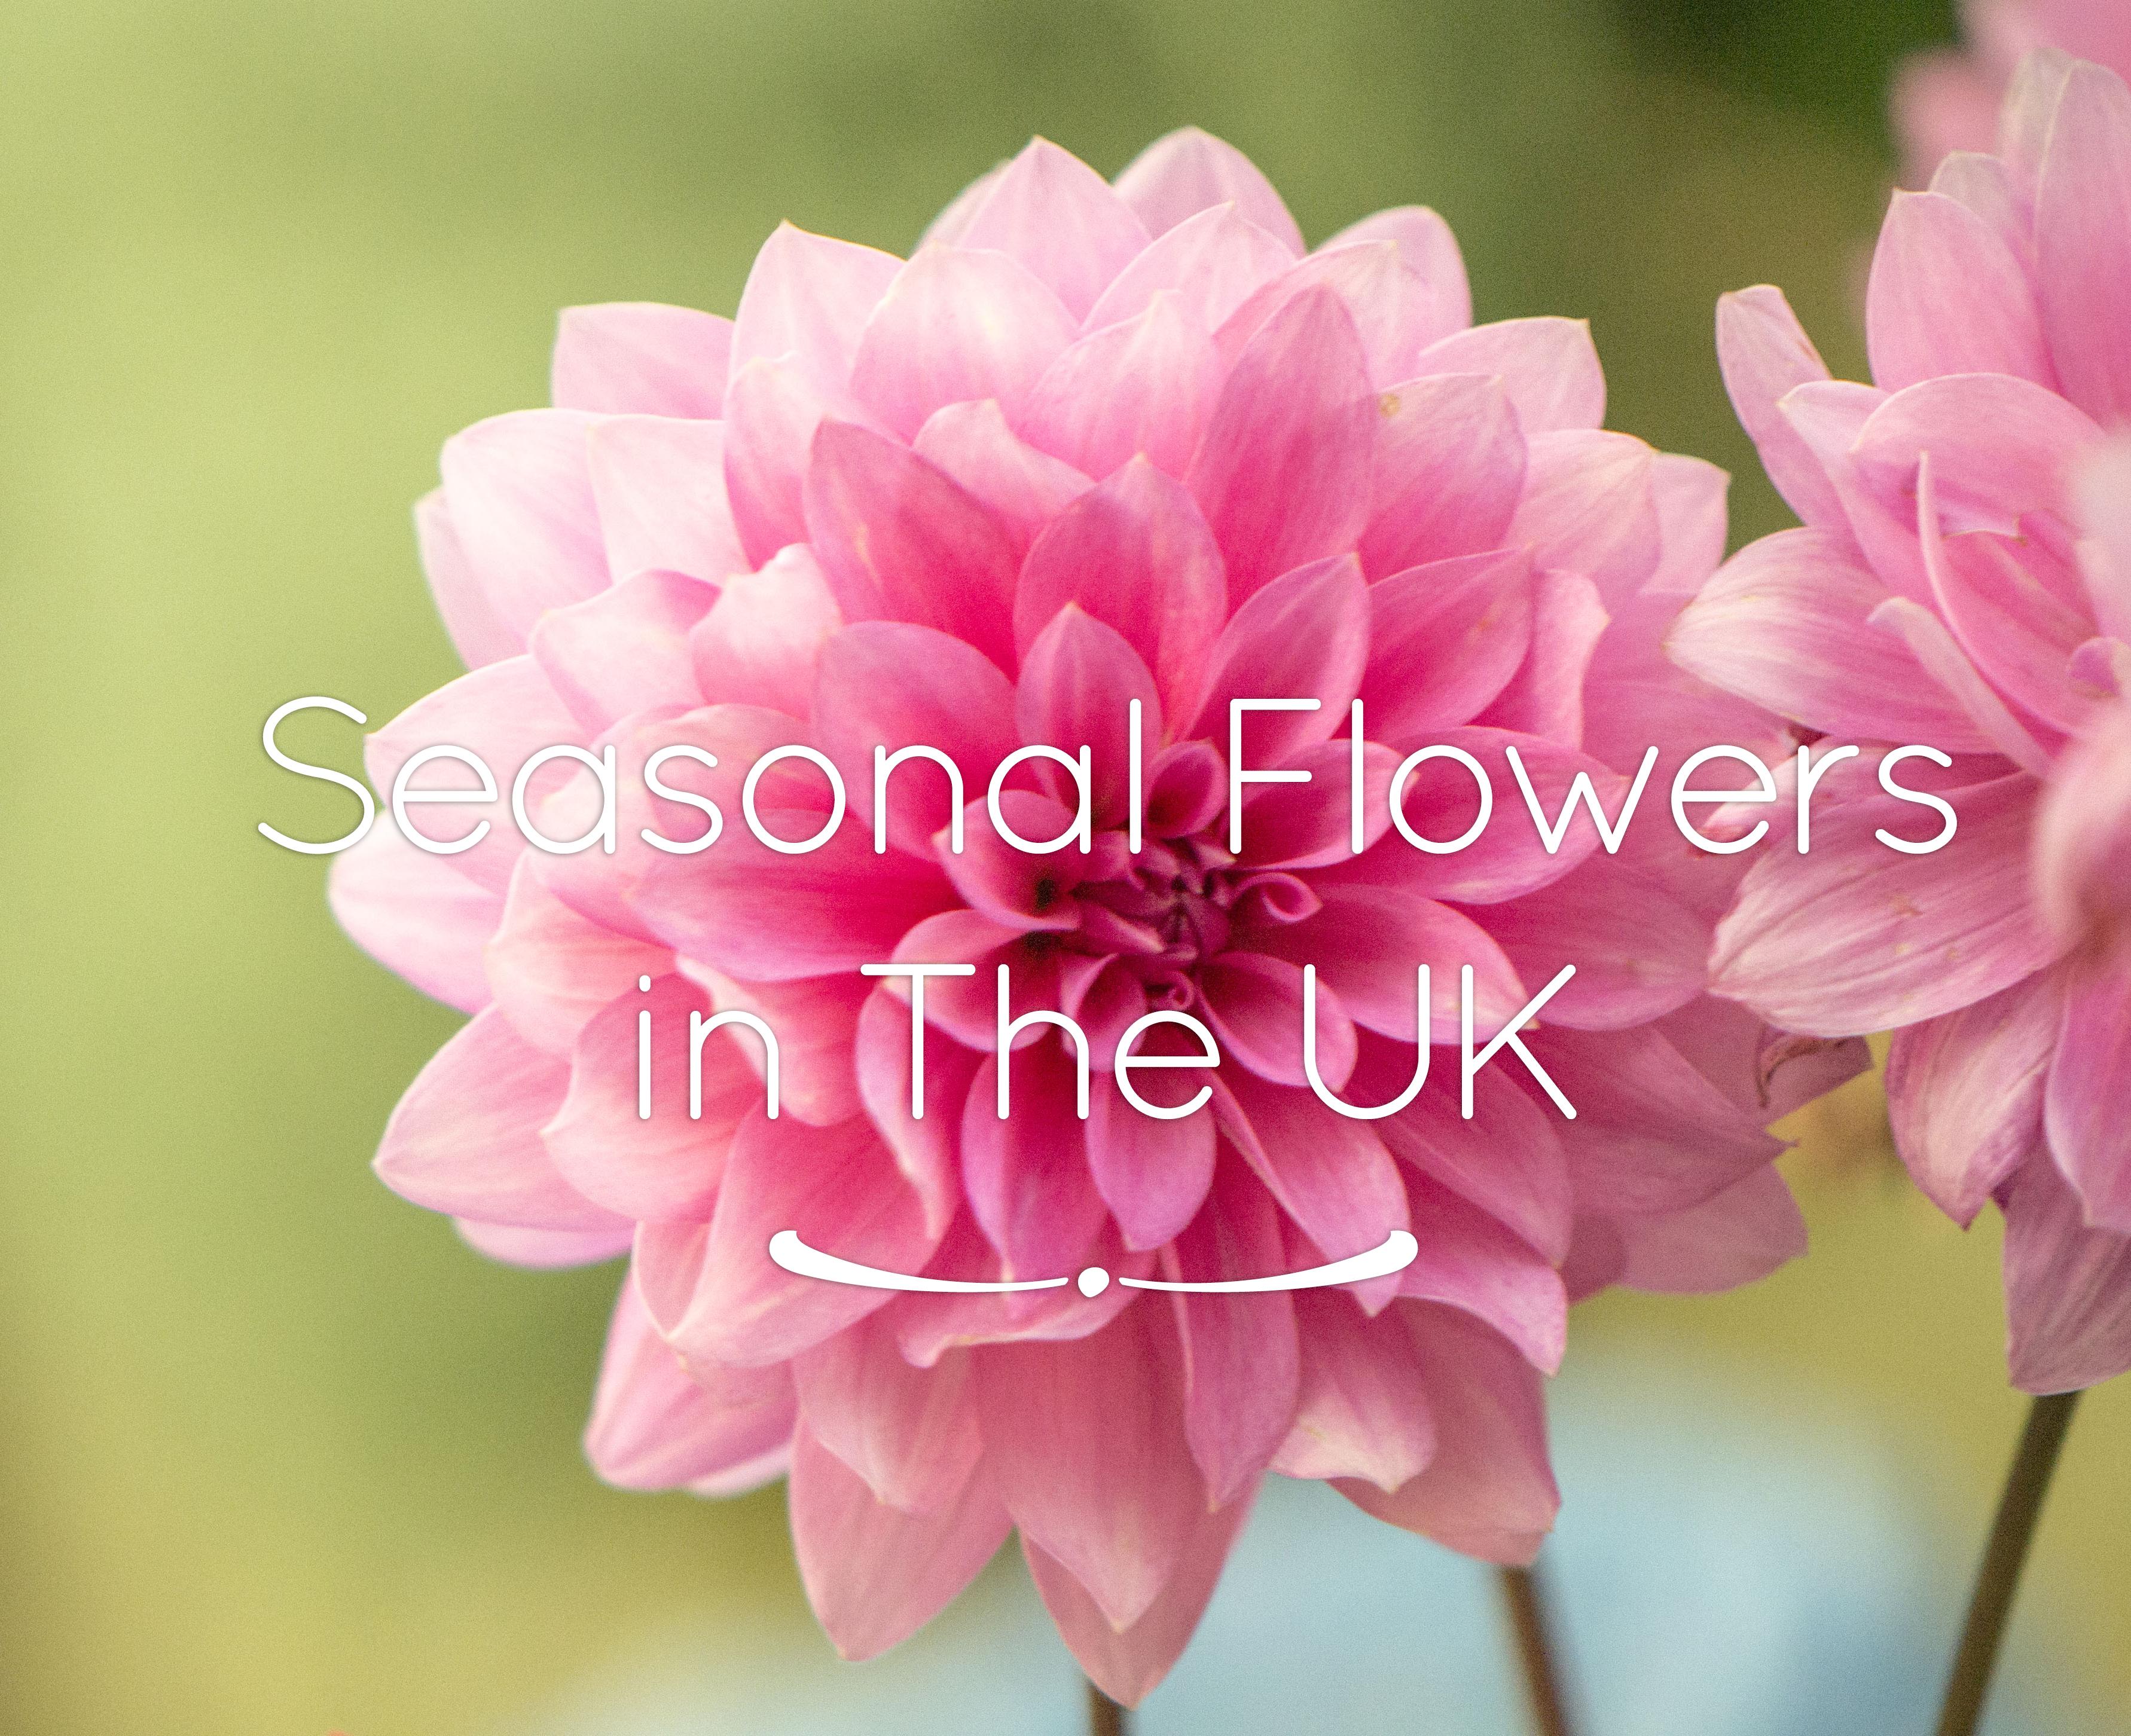 UK Seasonal Flowers